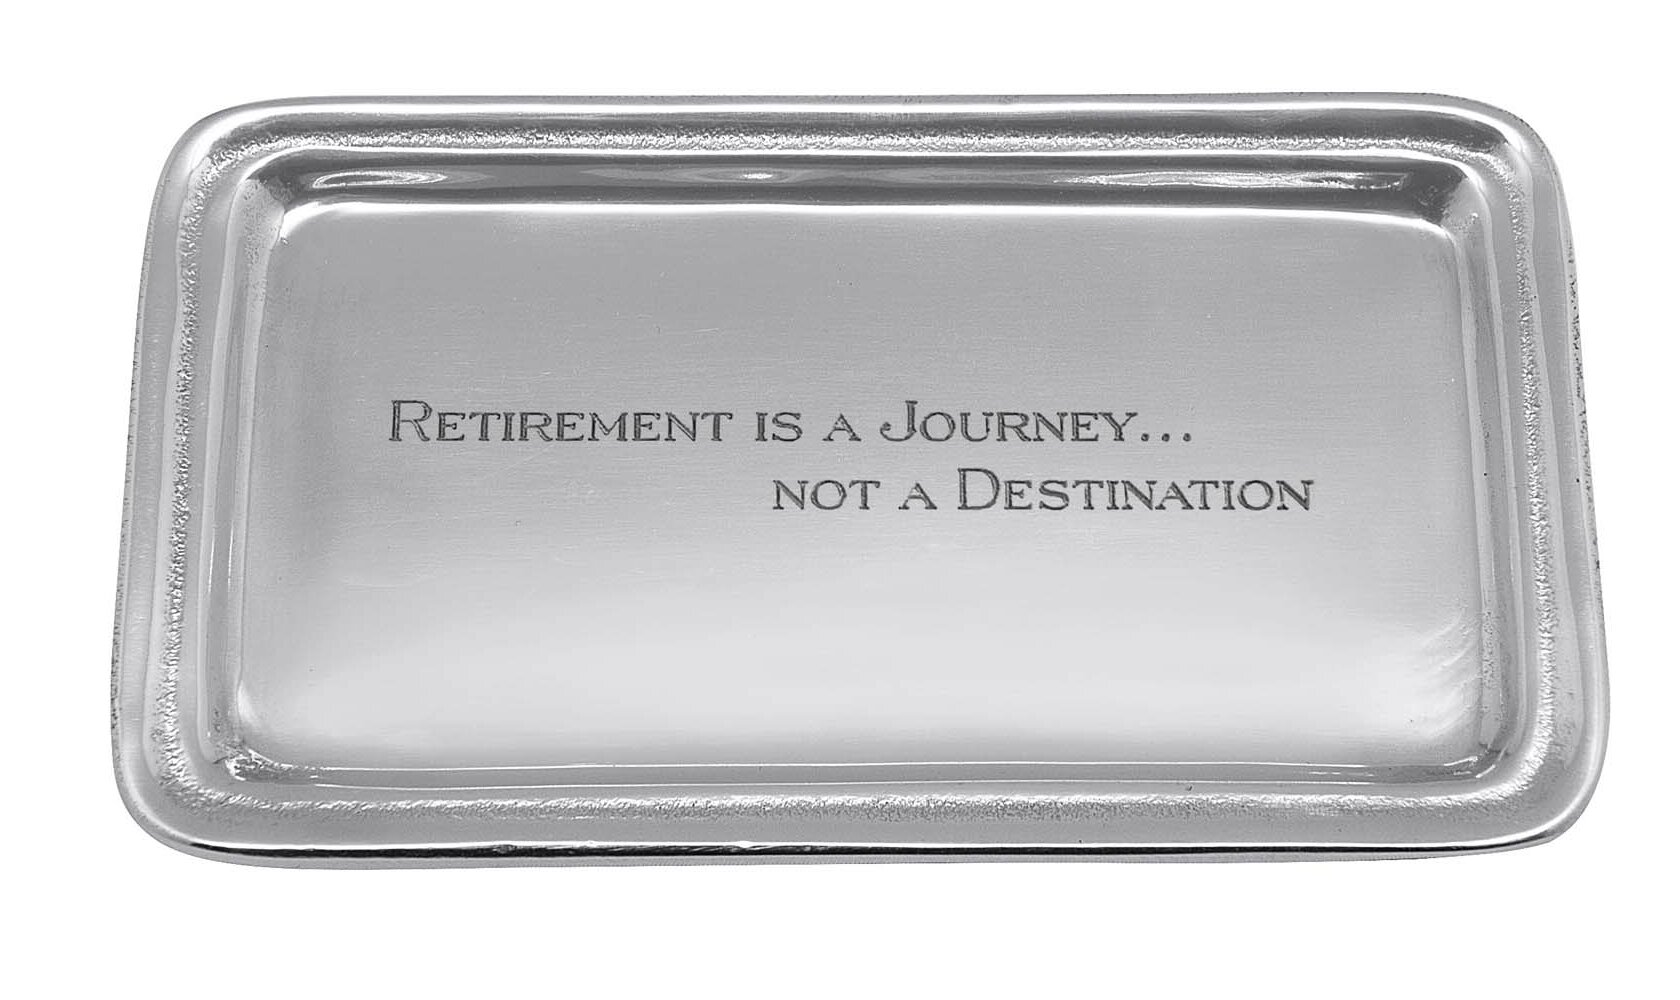 Mariposa Retirement Is A Journey Not A Destination Signature Statement Serving Tray Wayfair